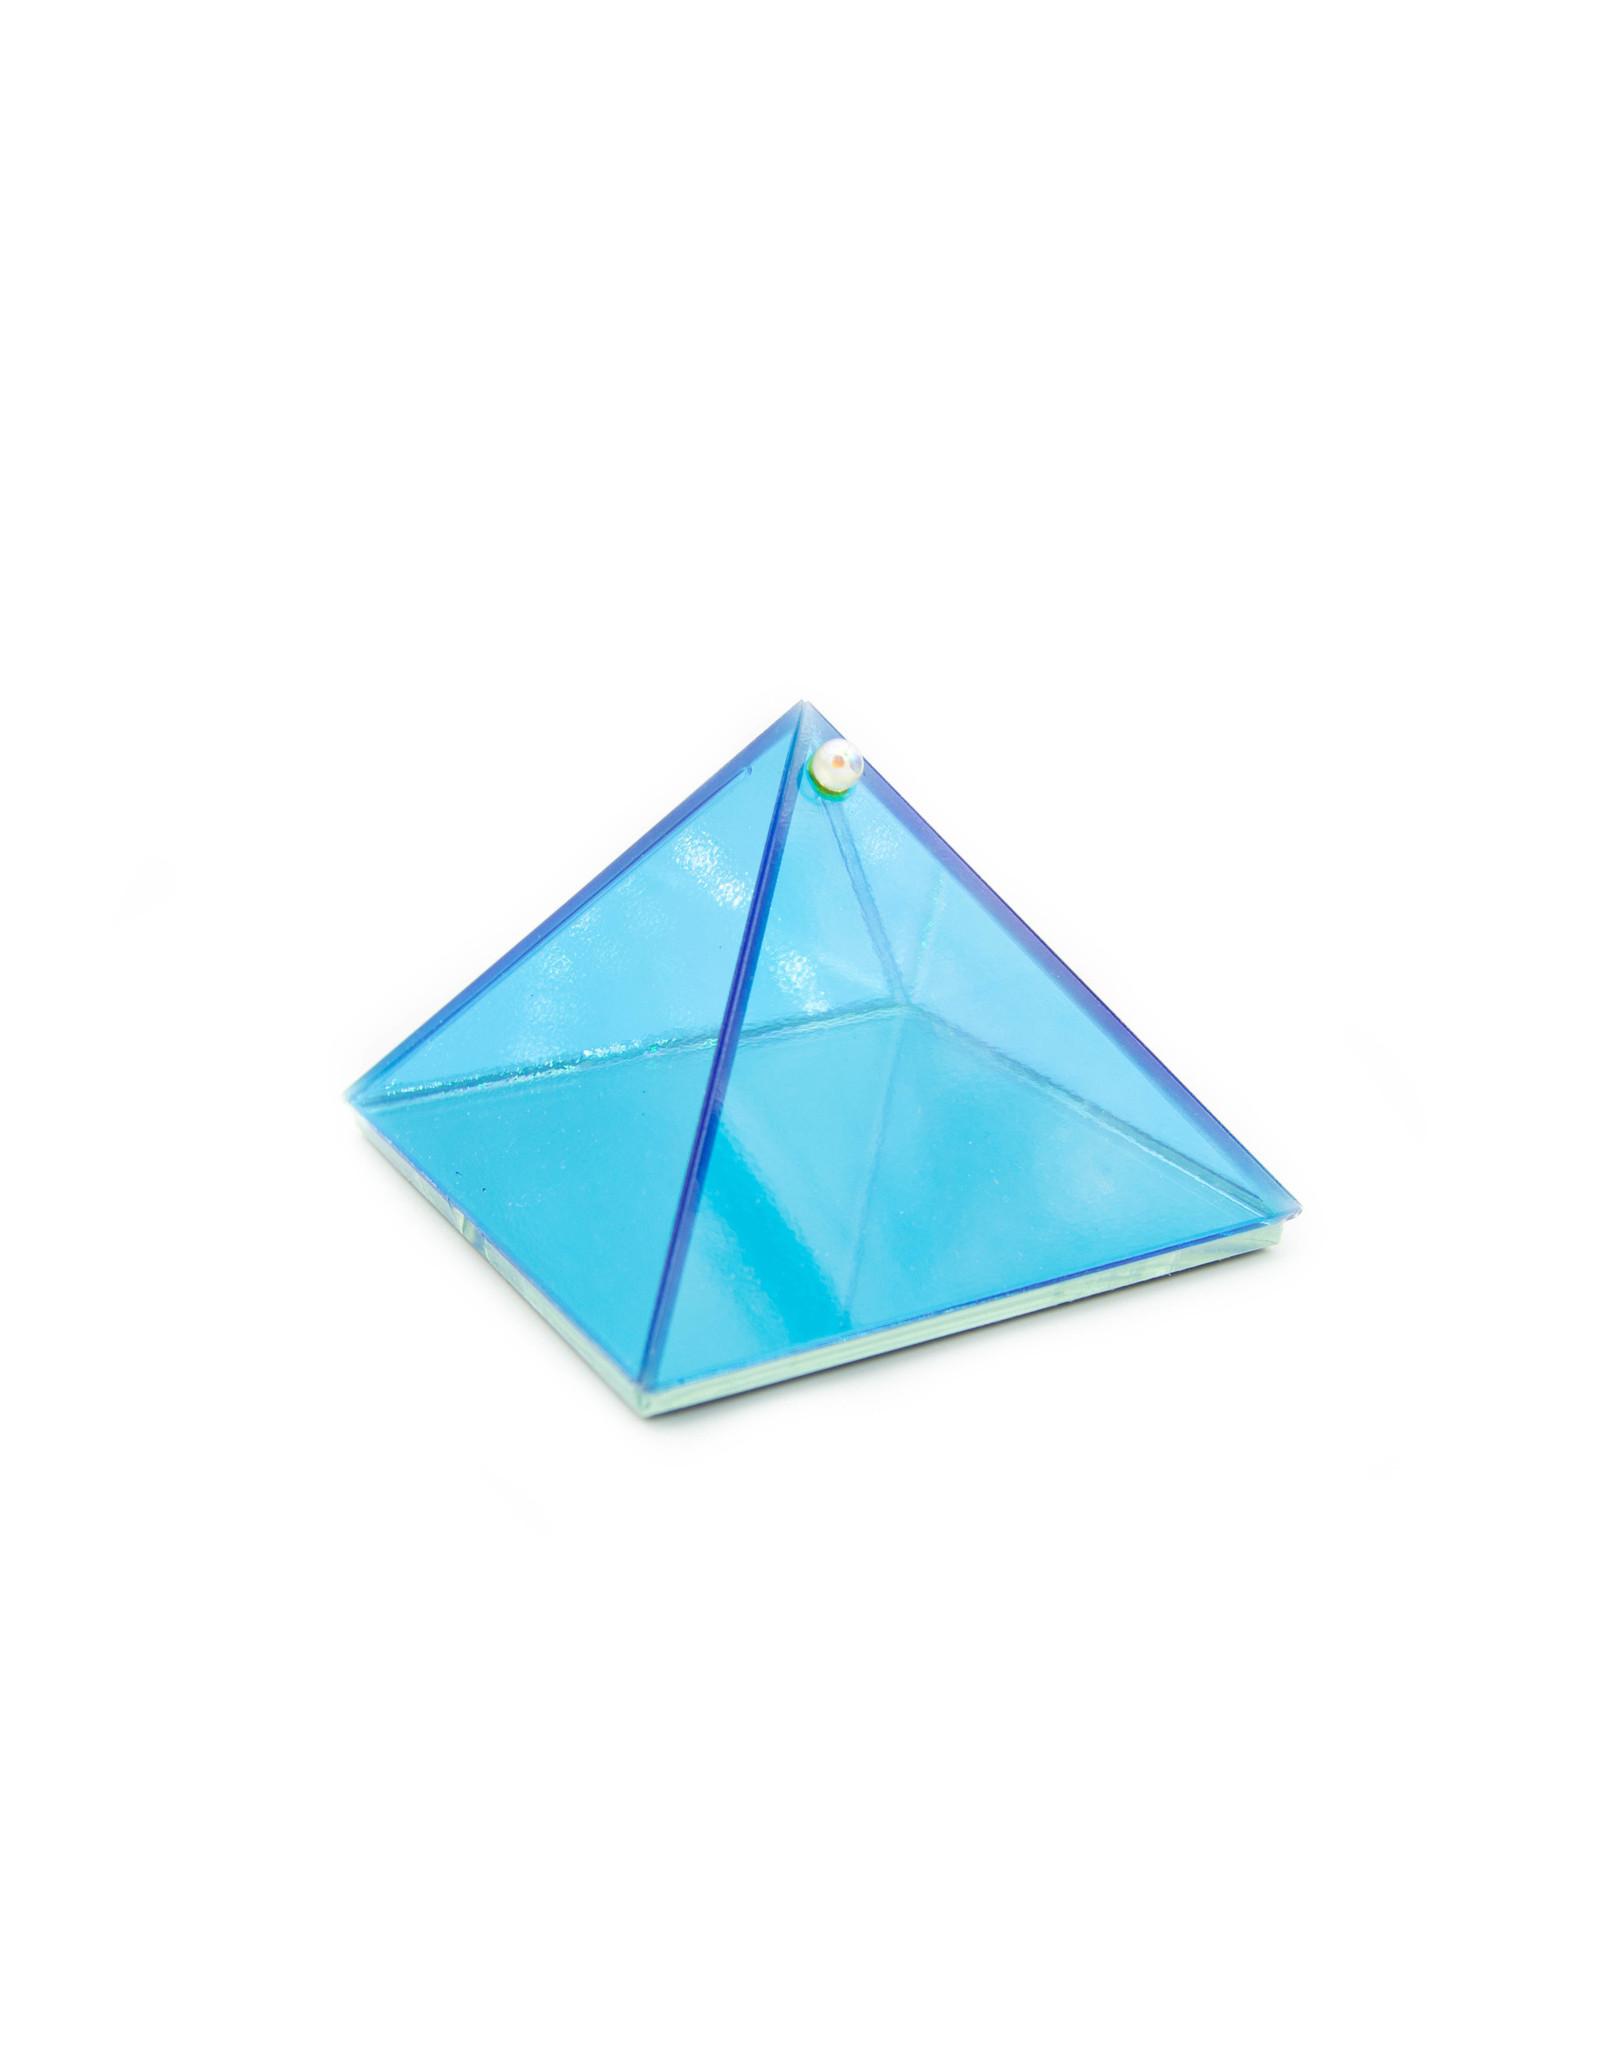 Pyramide à souhait Aqua